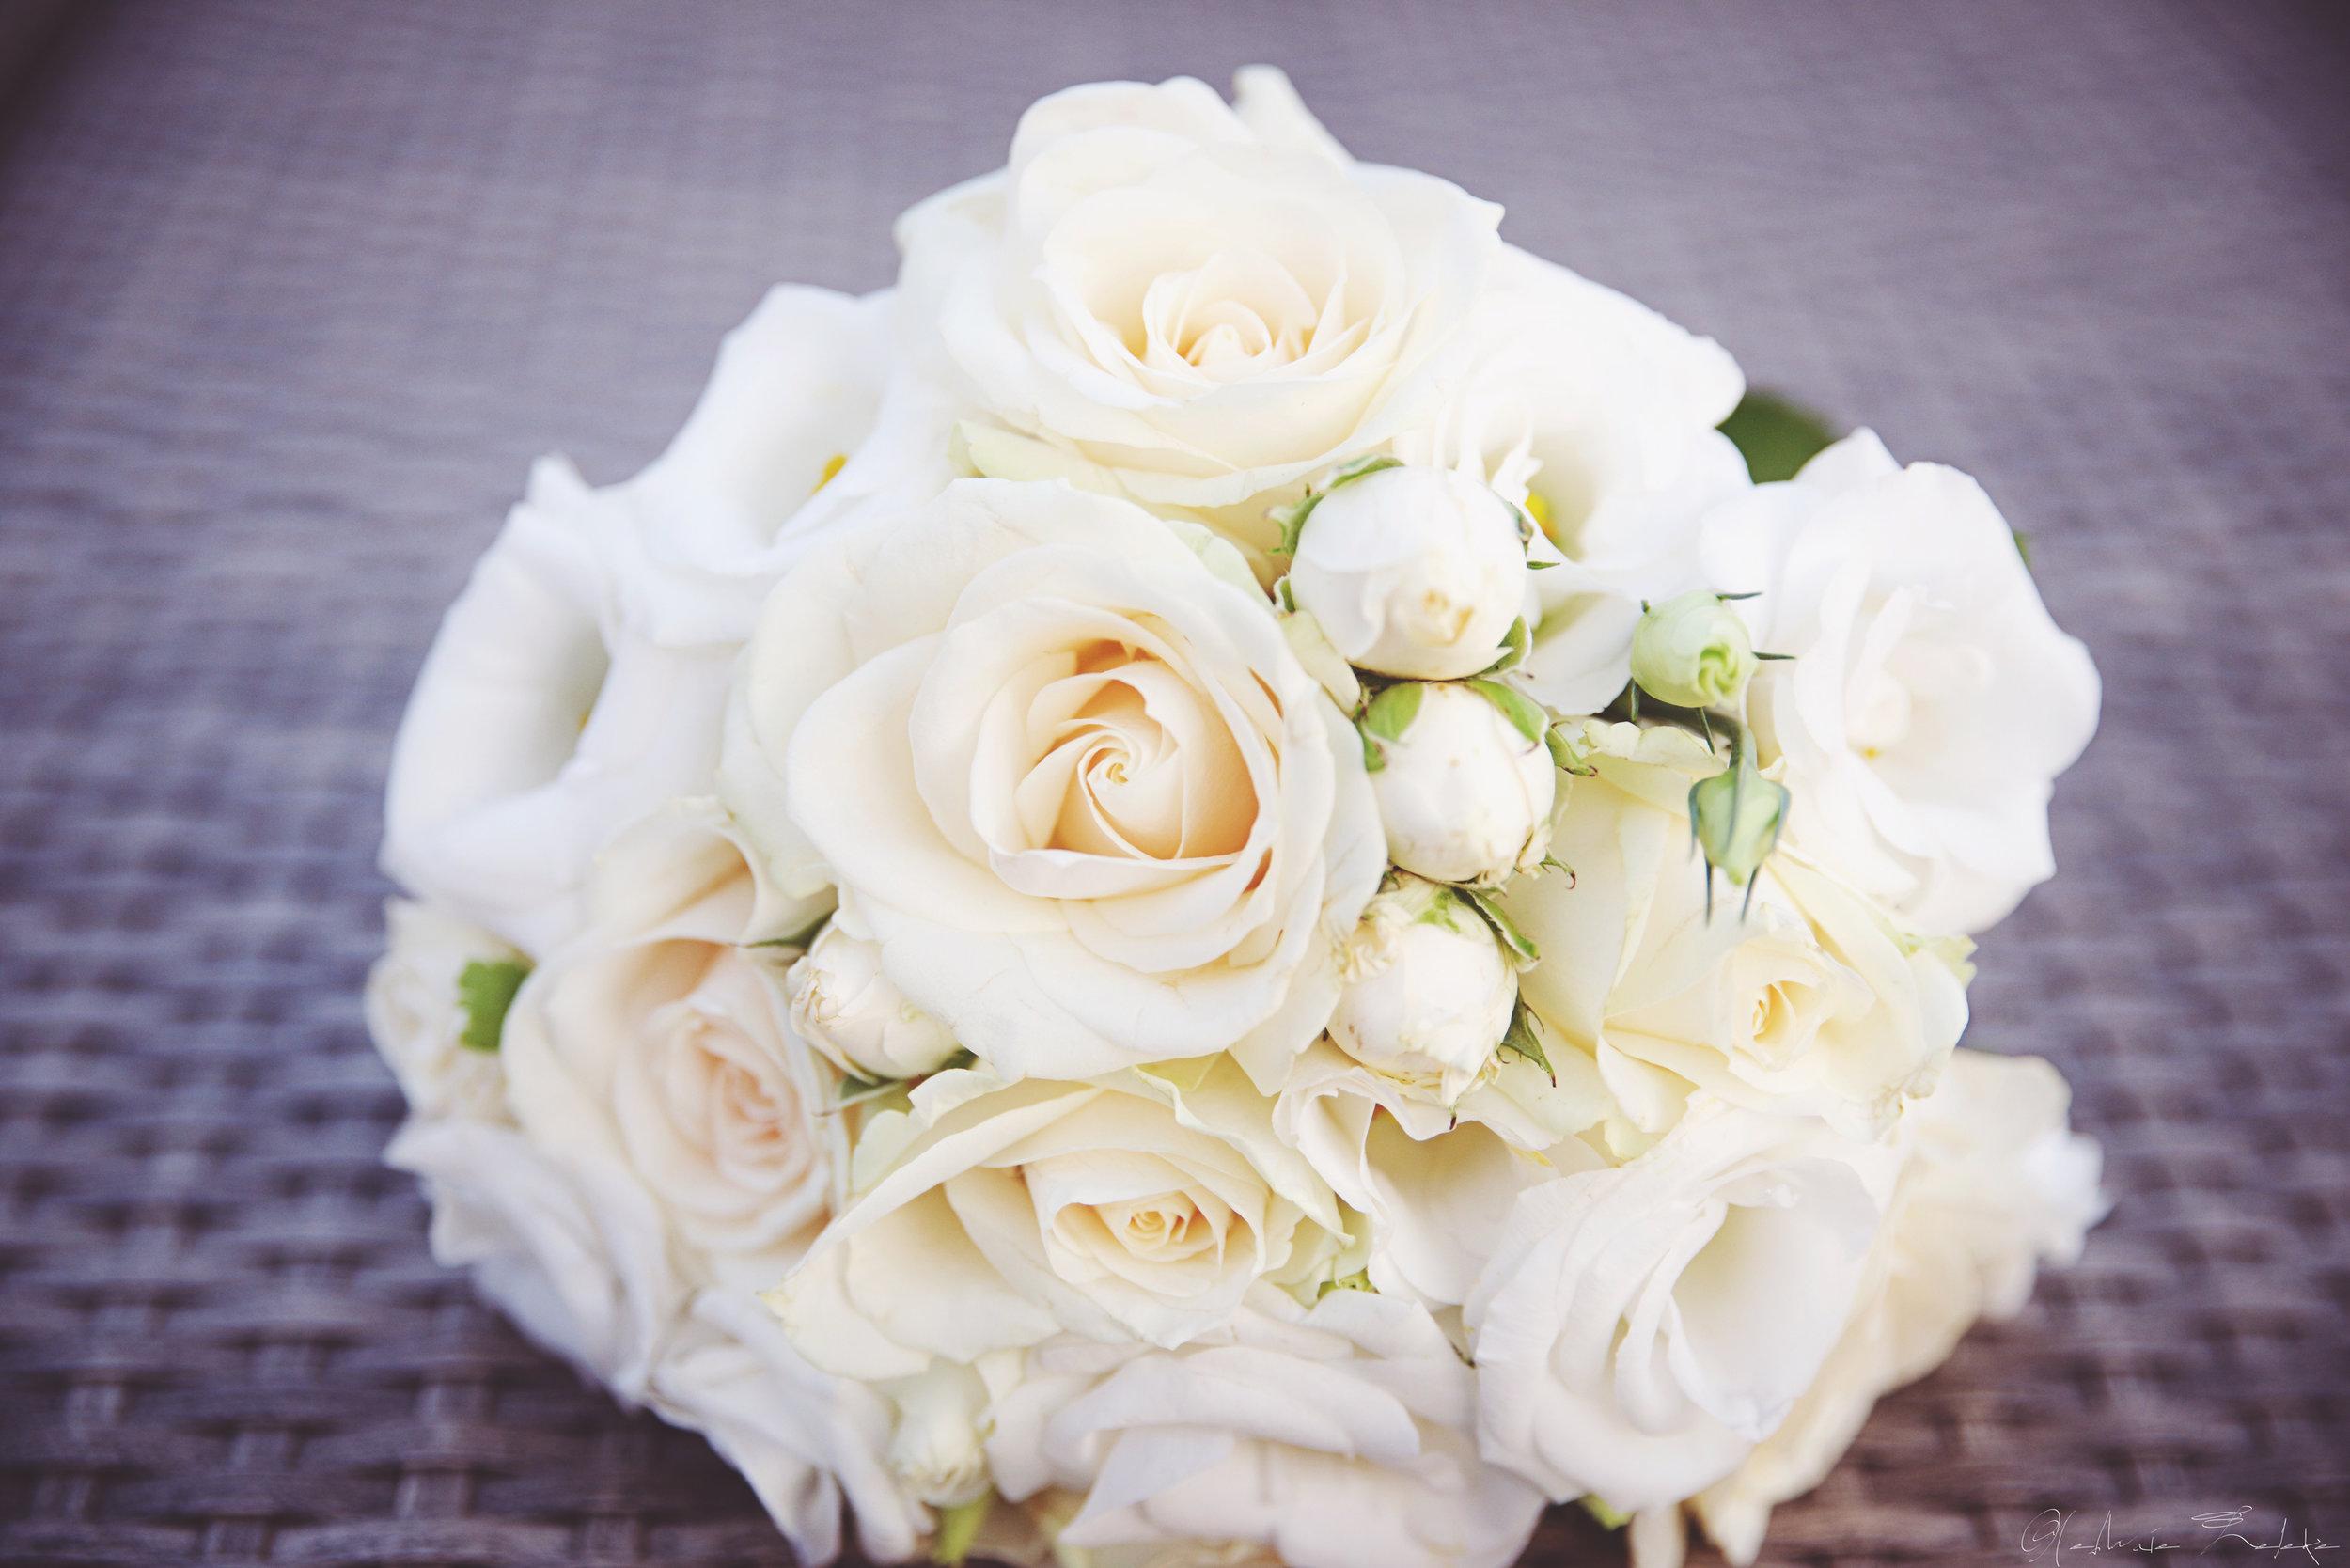 Cassidy-Ryan-Wedding-Florence-162.jpg